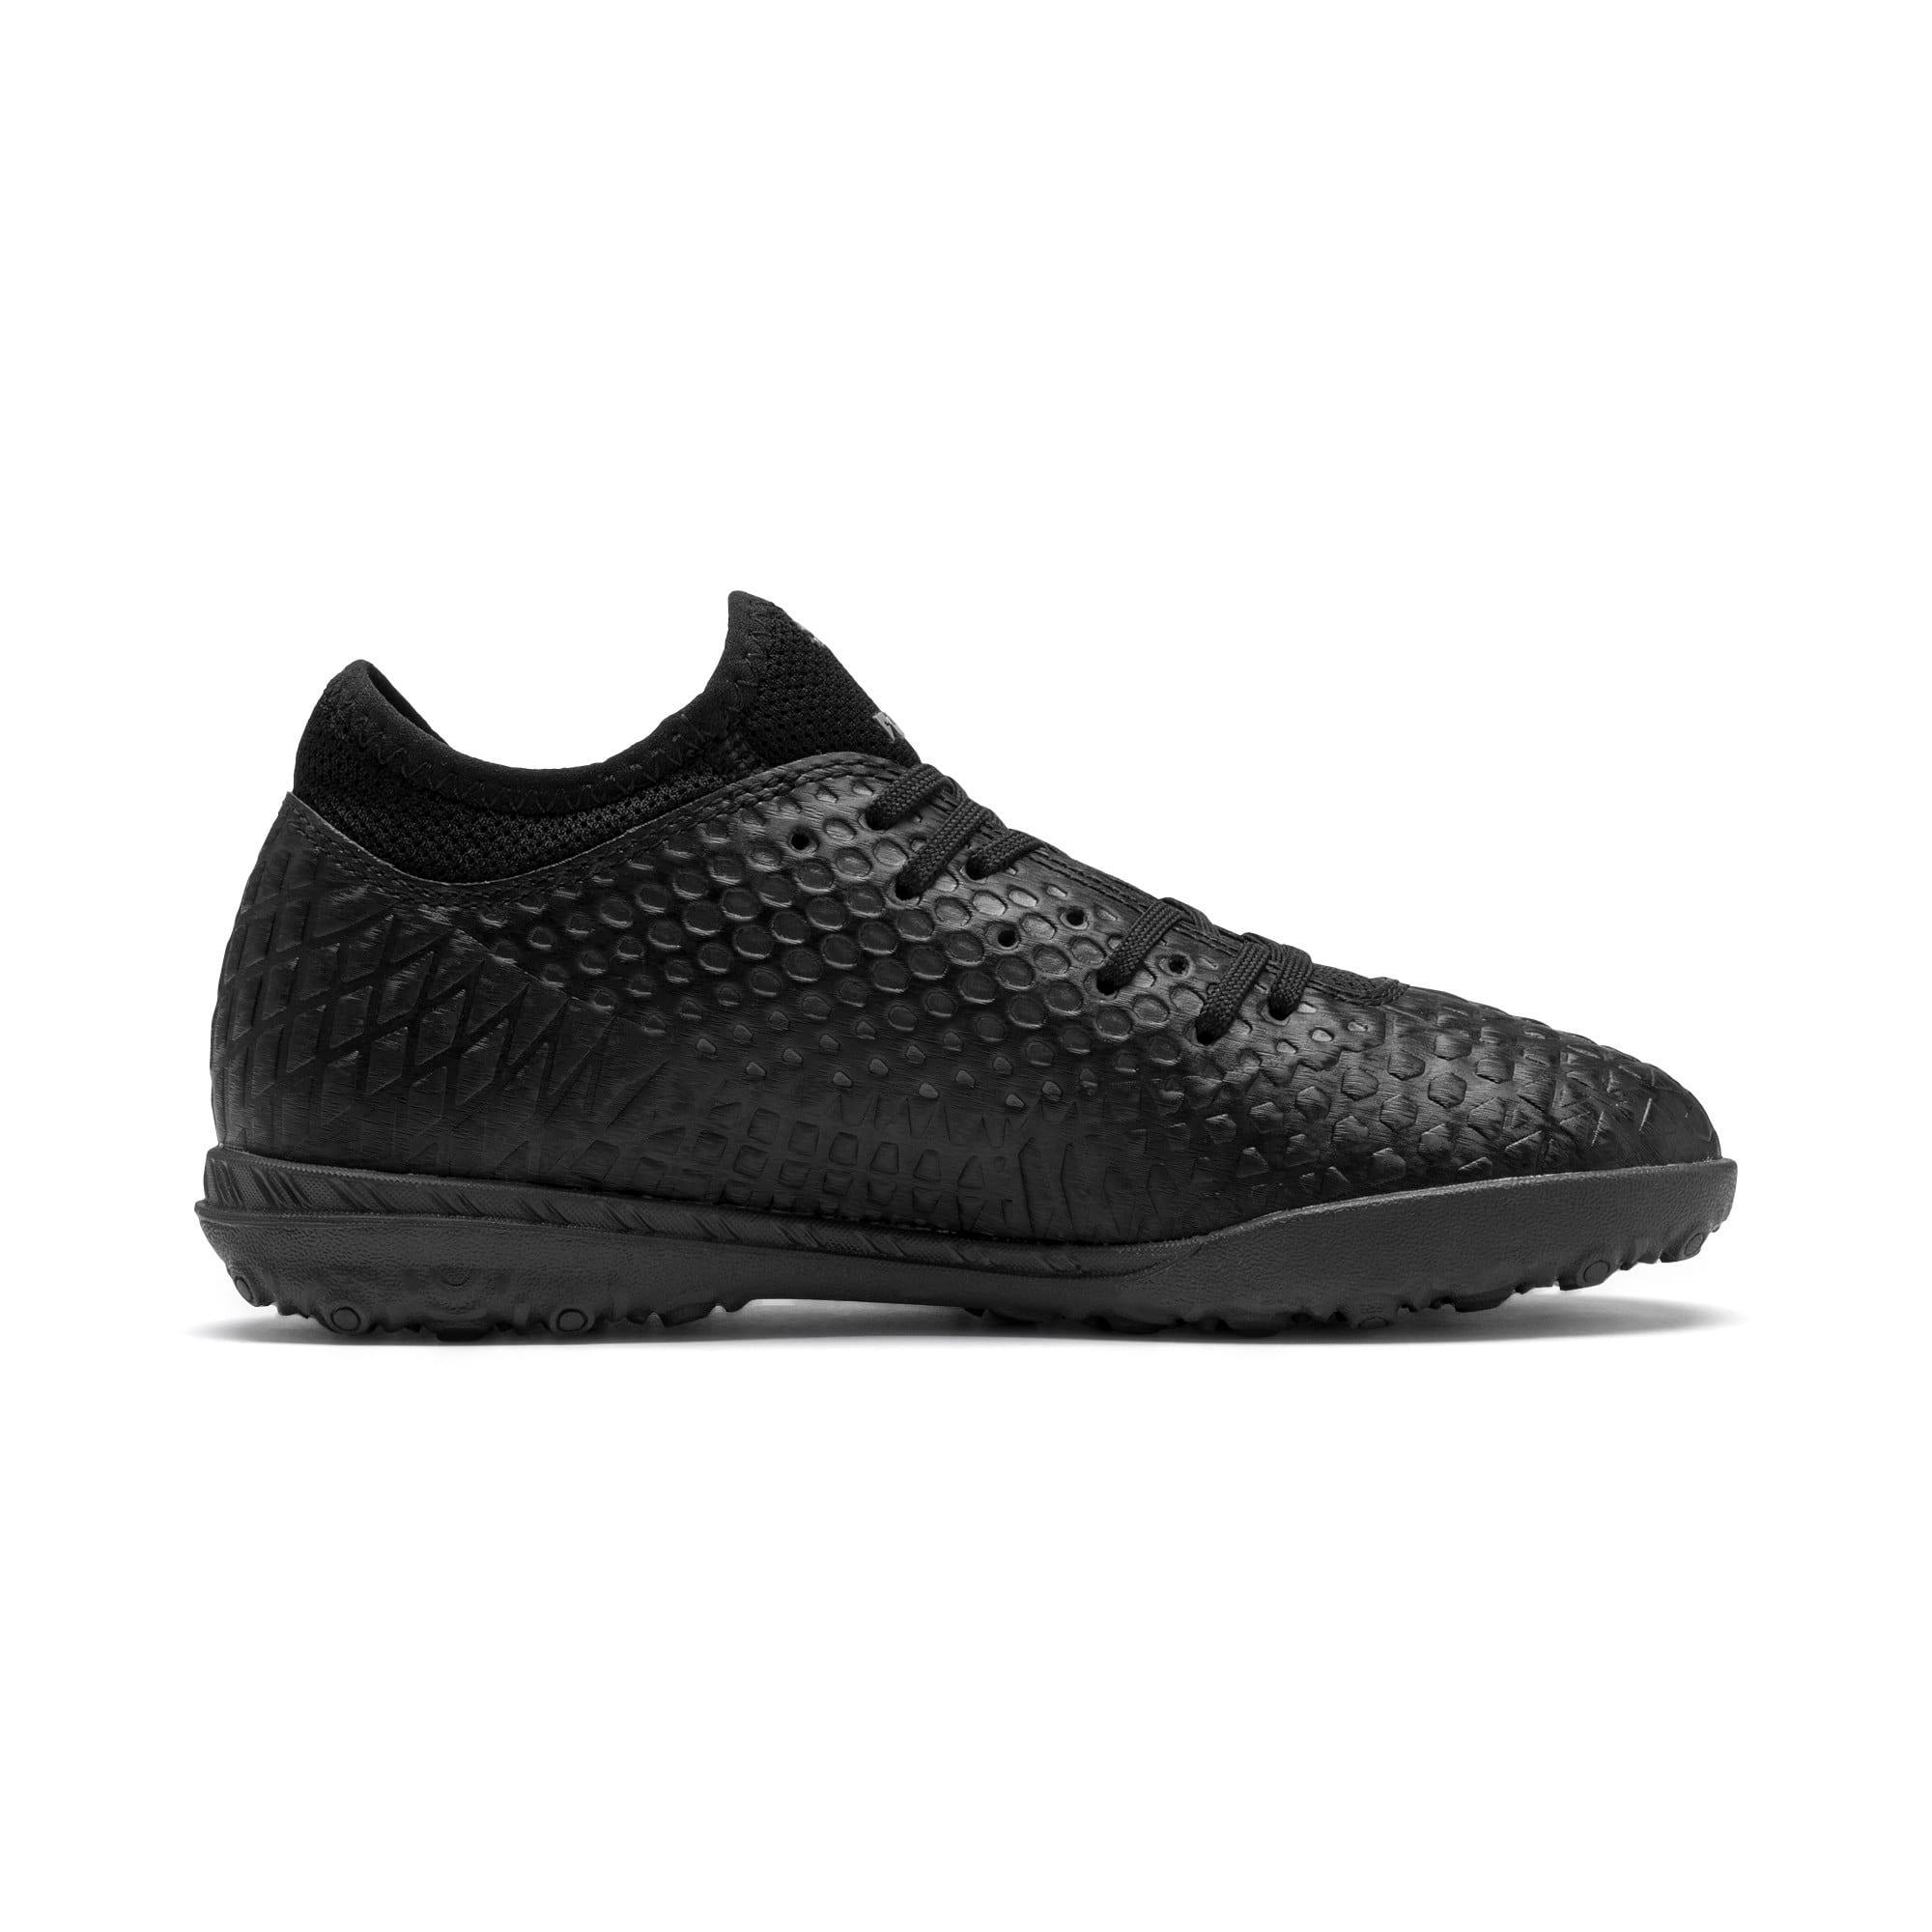 Thumbnail 5 of Chaussure de foot FUTURE 4.4 TT Youth, Black-Black-Puma Aged Silver, medium